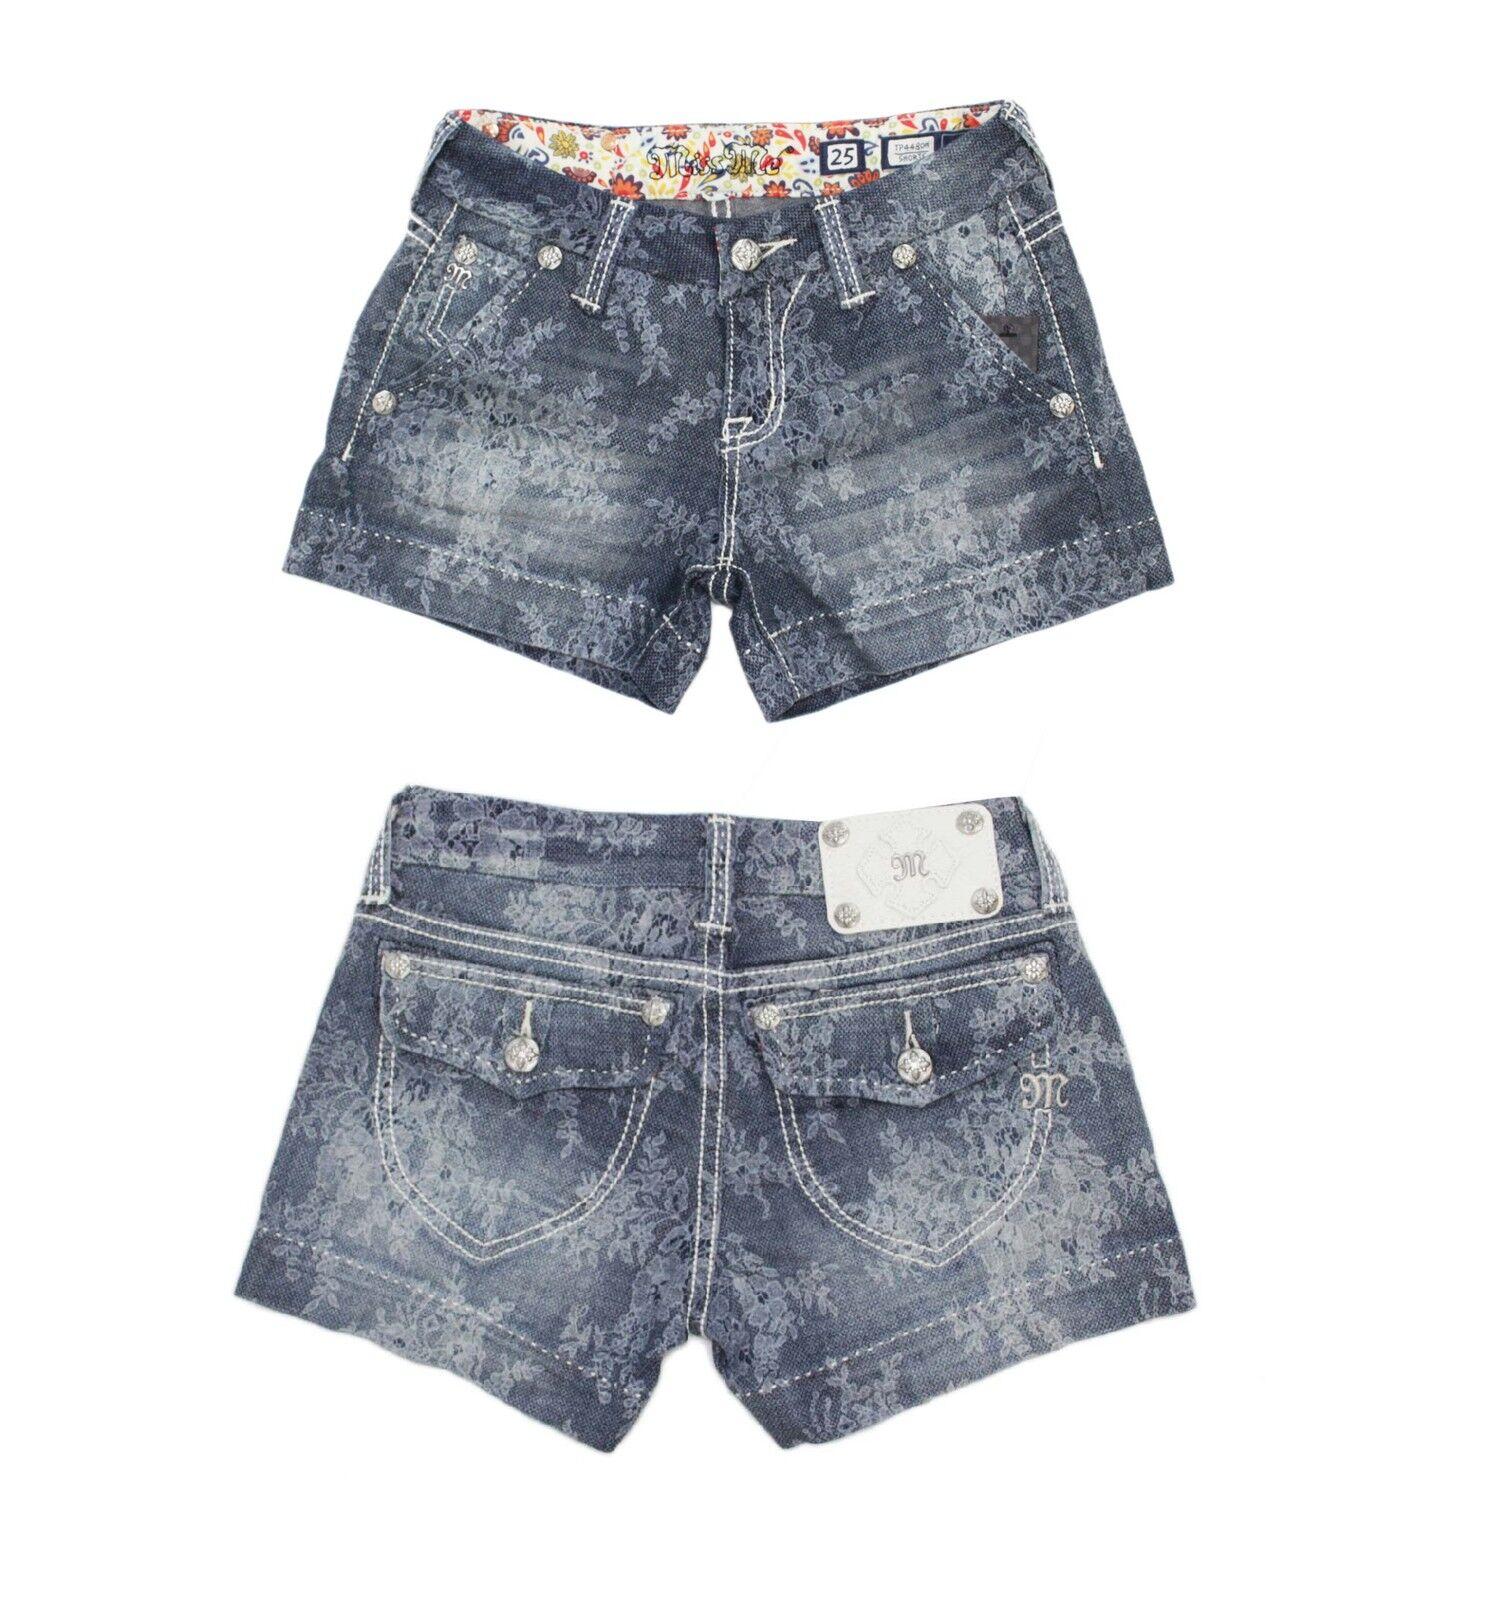 MISS ME Women's Floral Lace Print Indigo Summer Denim Shorts Jeans